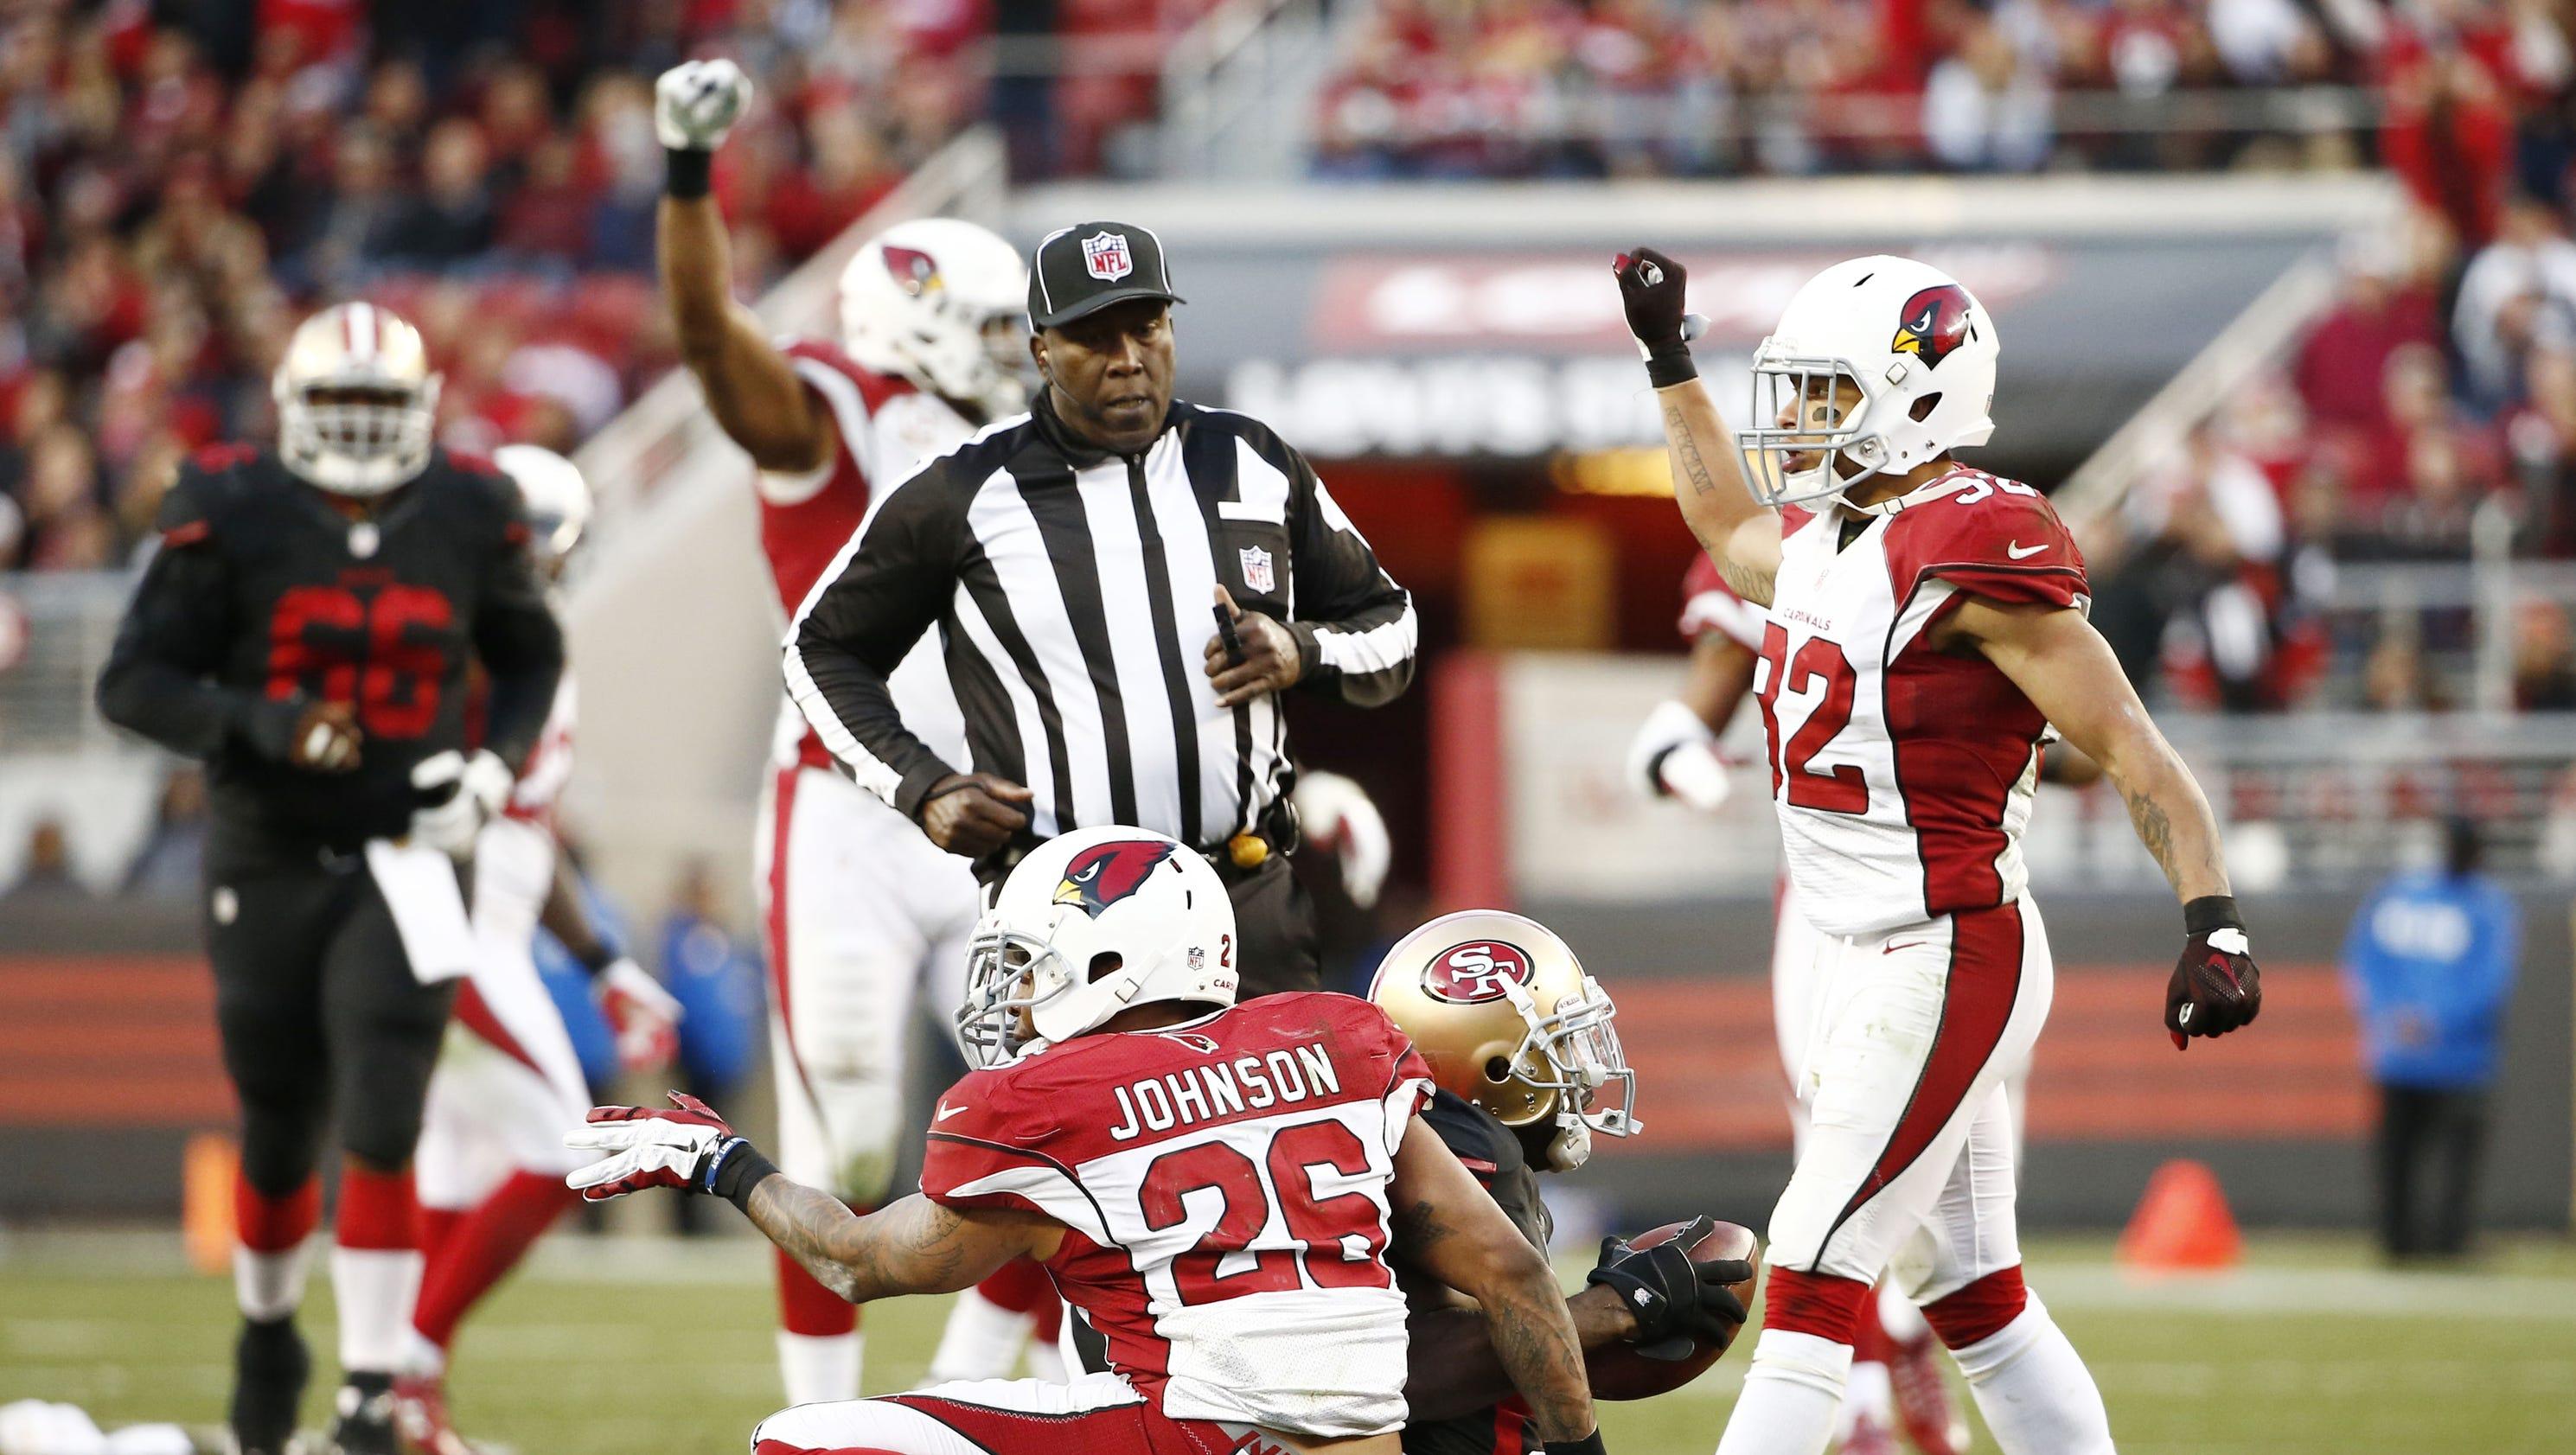 cardinals getting stingy defense